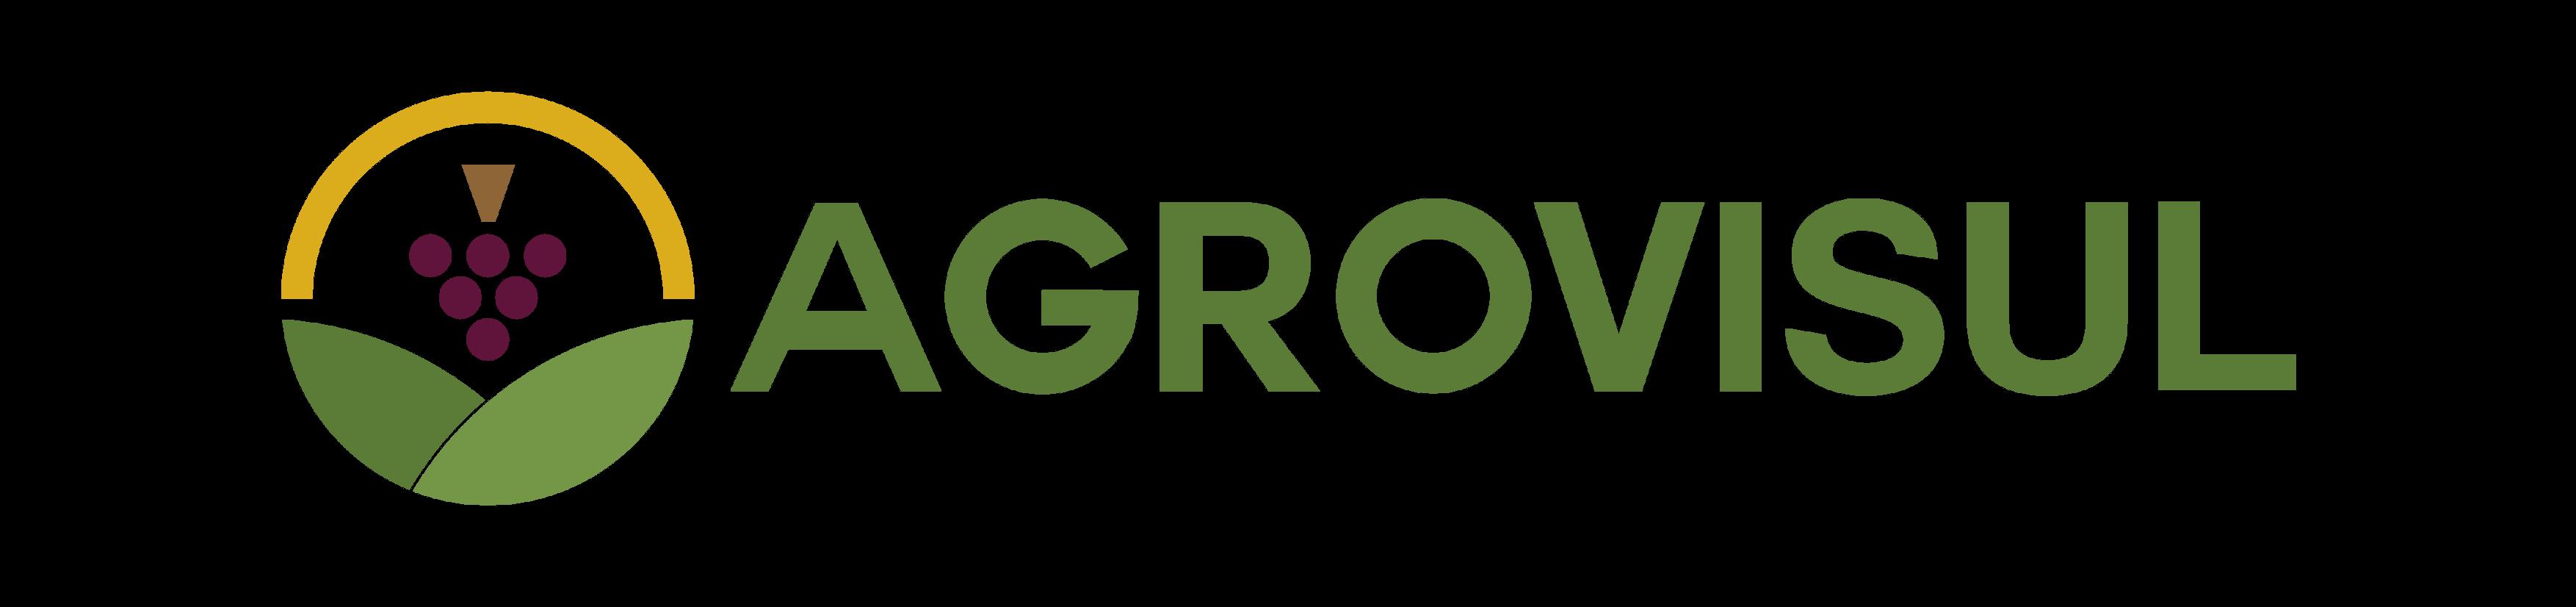 Agrovisul